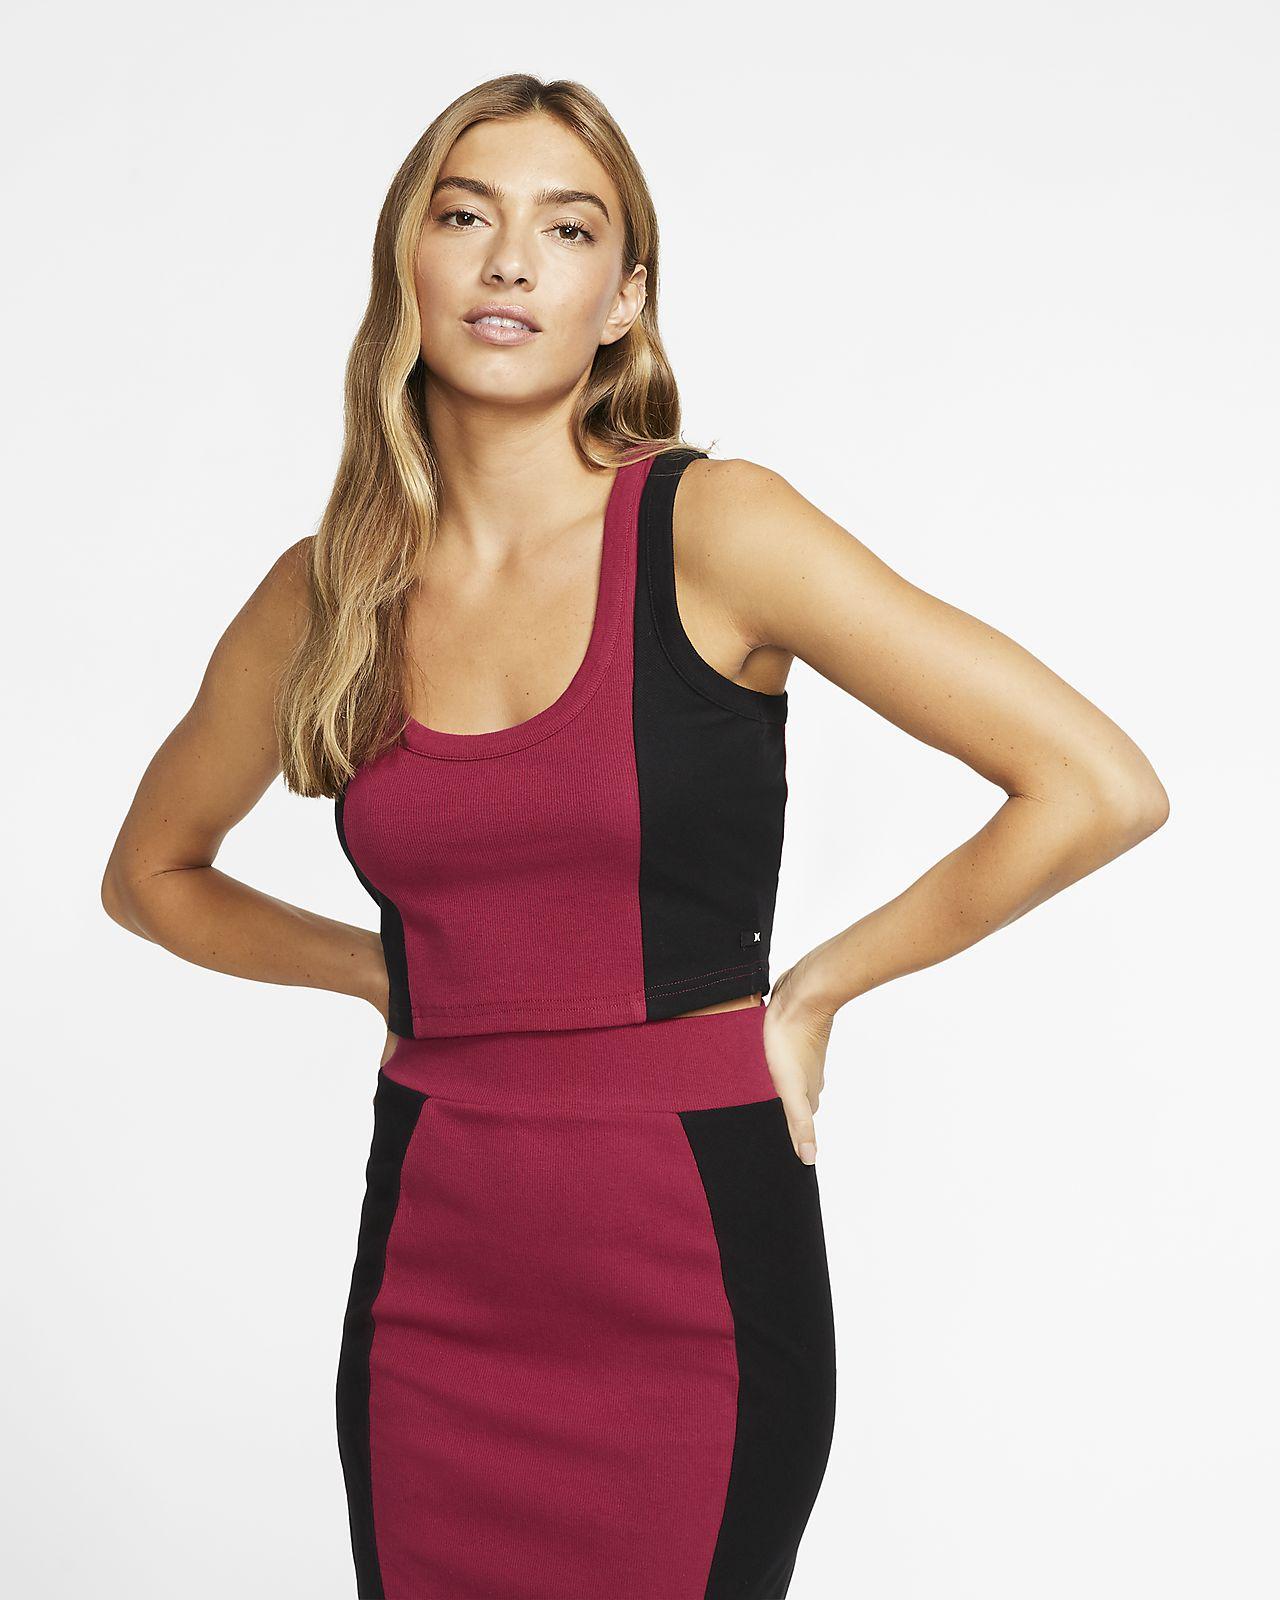 Hurley Knit Set Women's Top